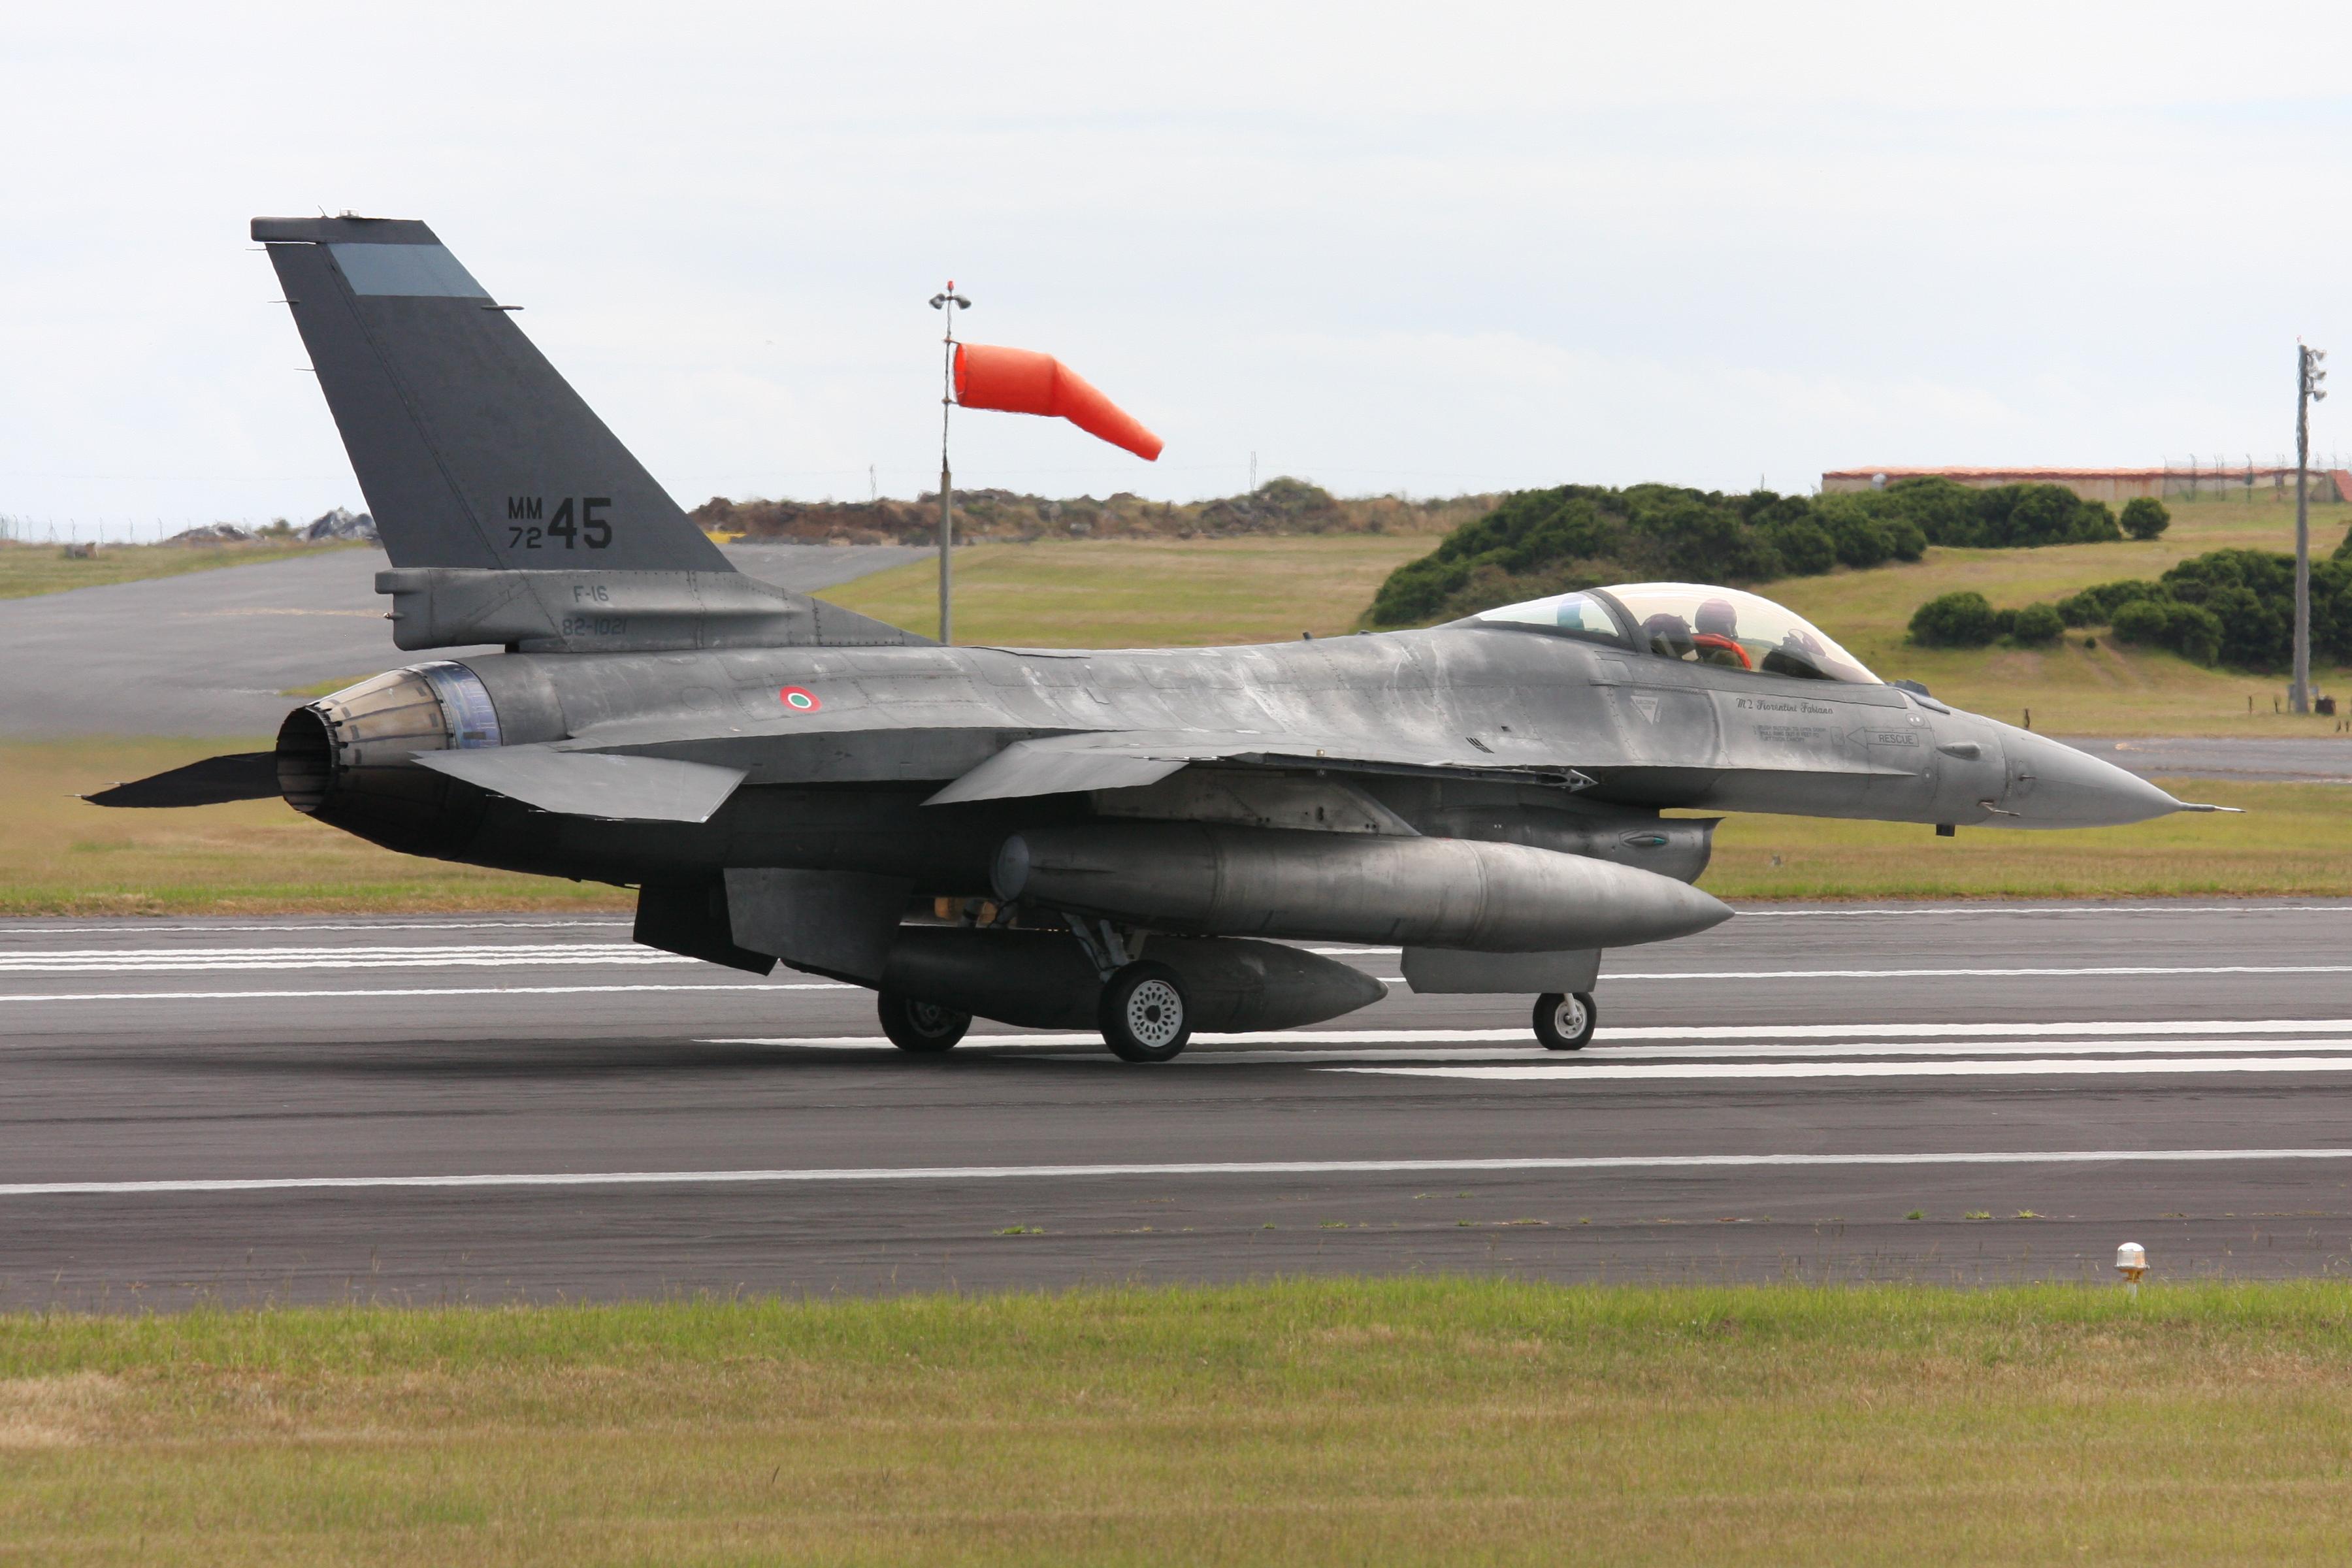 2010-08-08_F-16_Italian_Airforce_01.jpg